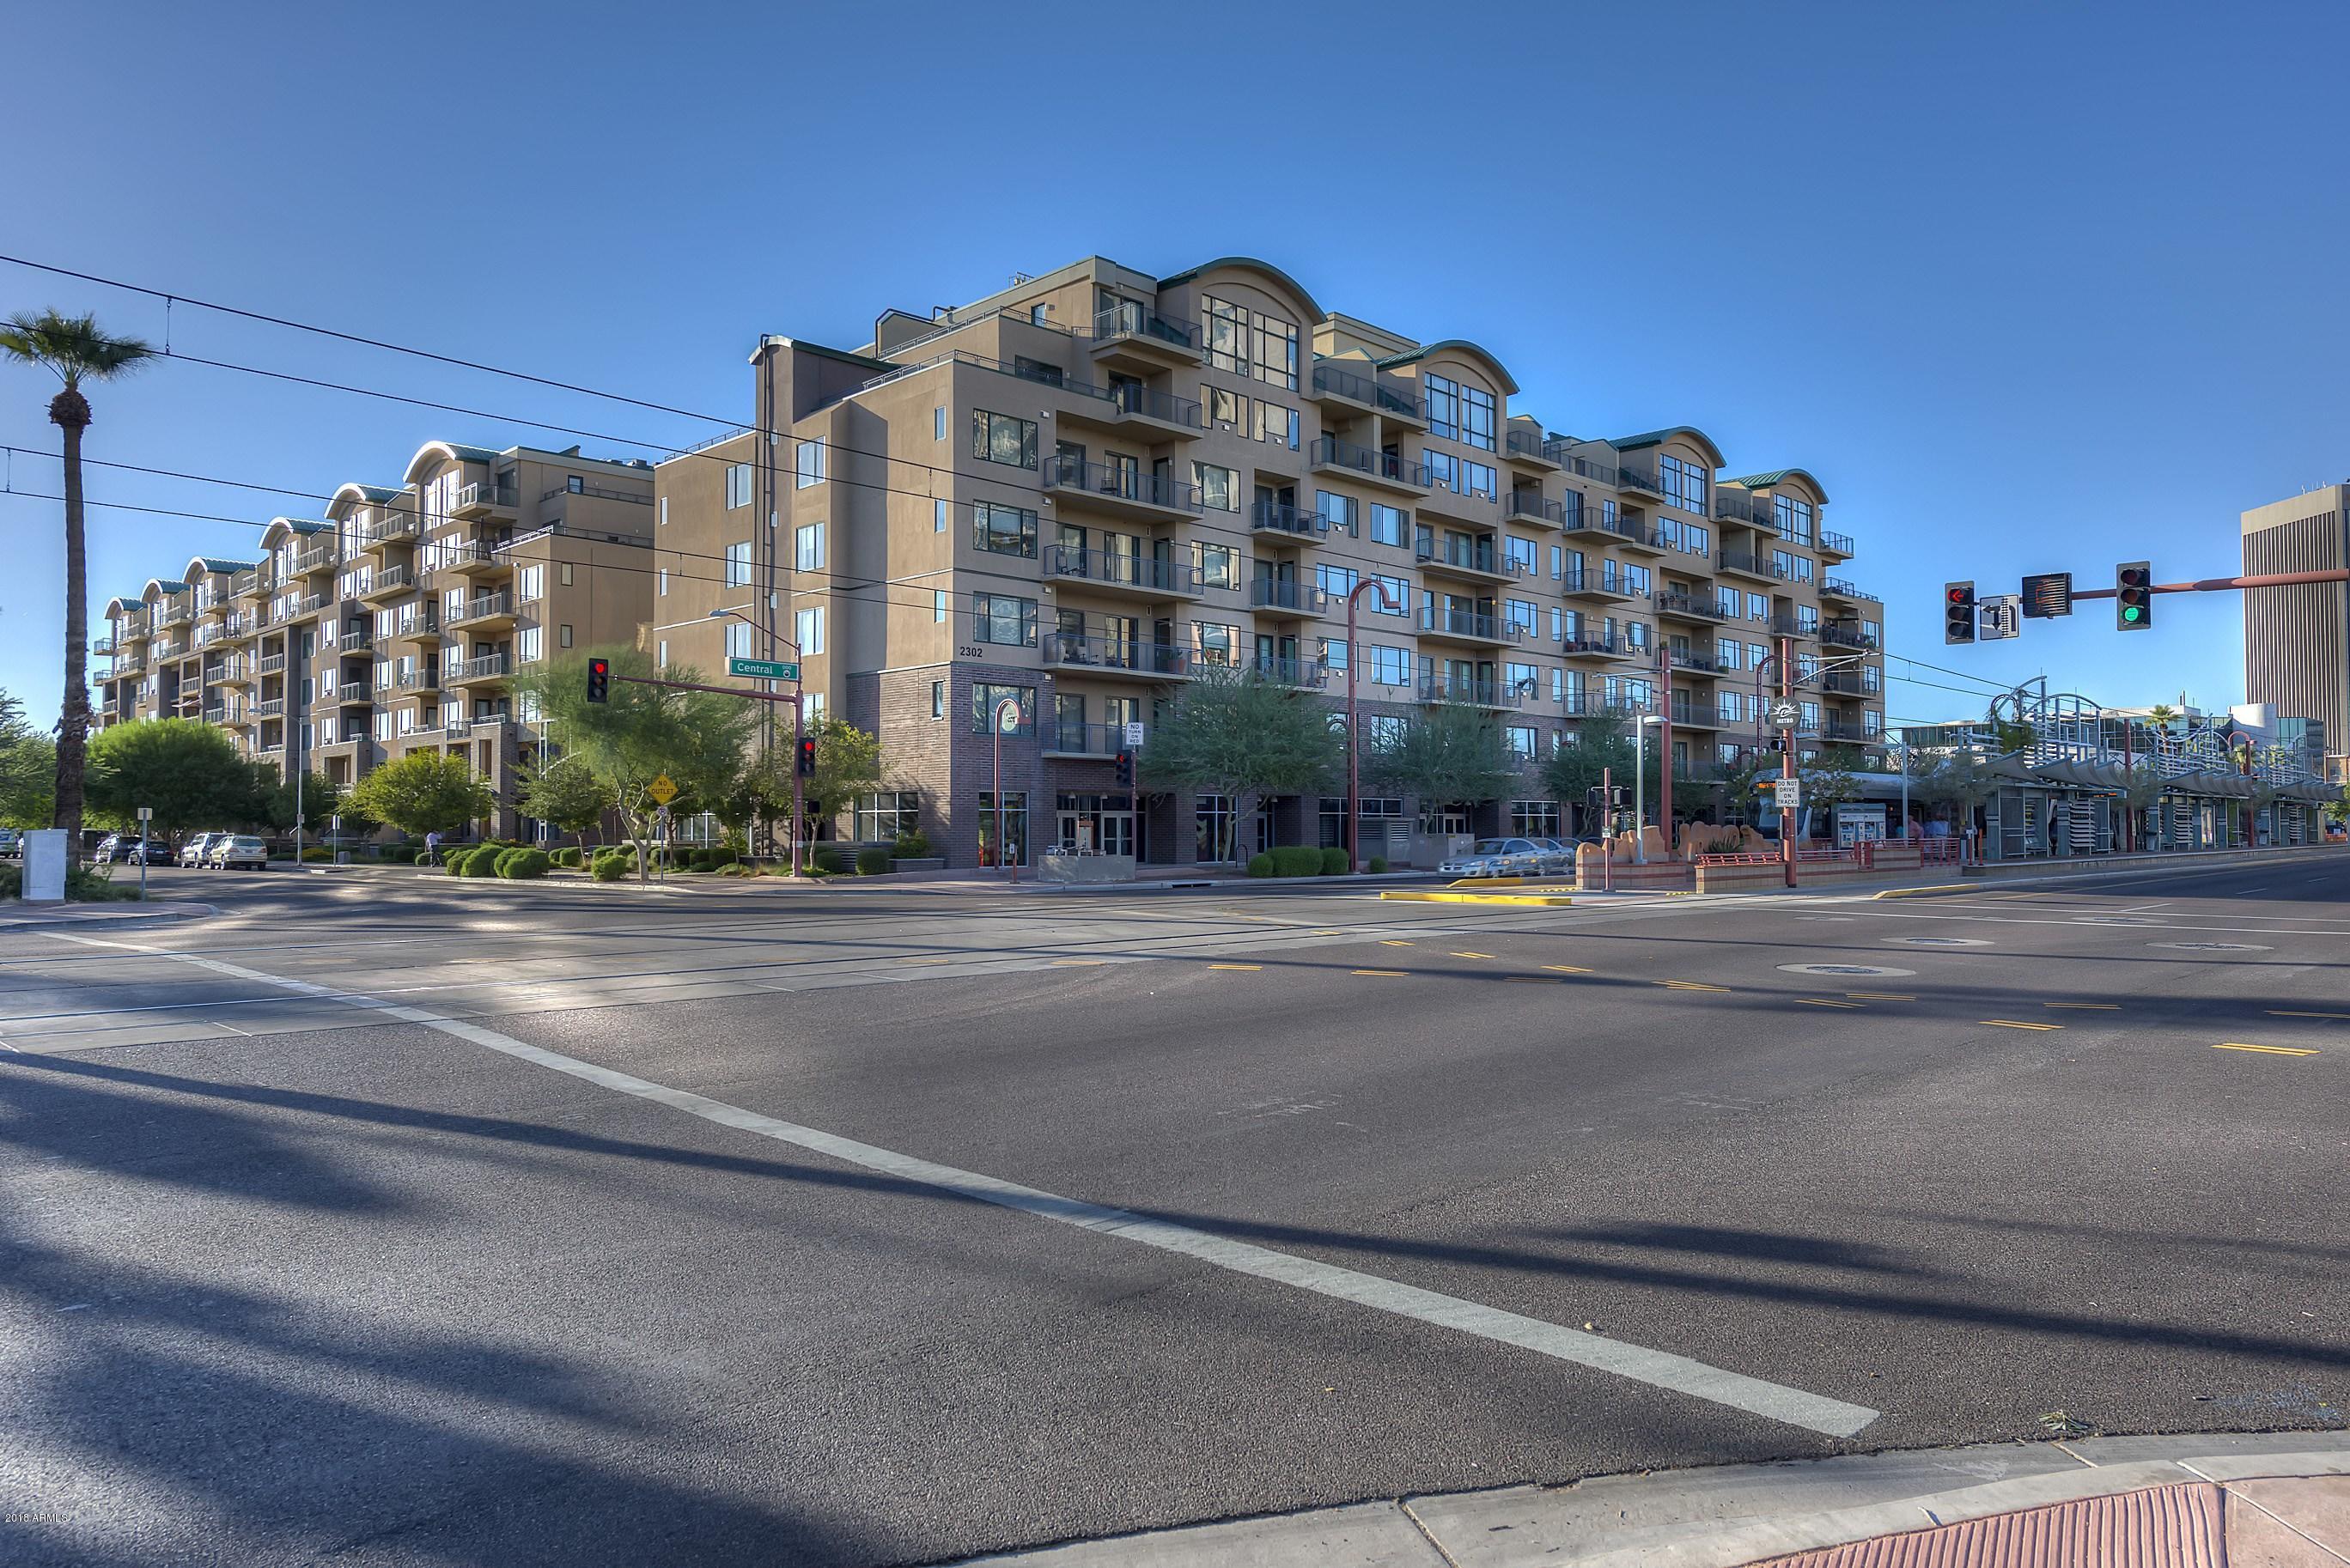 MLS 5841876 16 W ENCANTO Boulevard Unit 617 Building B, Phoenix, AZ 85003 Phoenix AZ Tapestry On Central